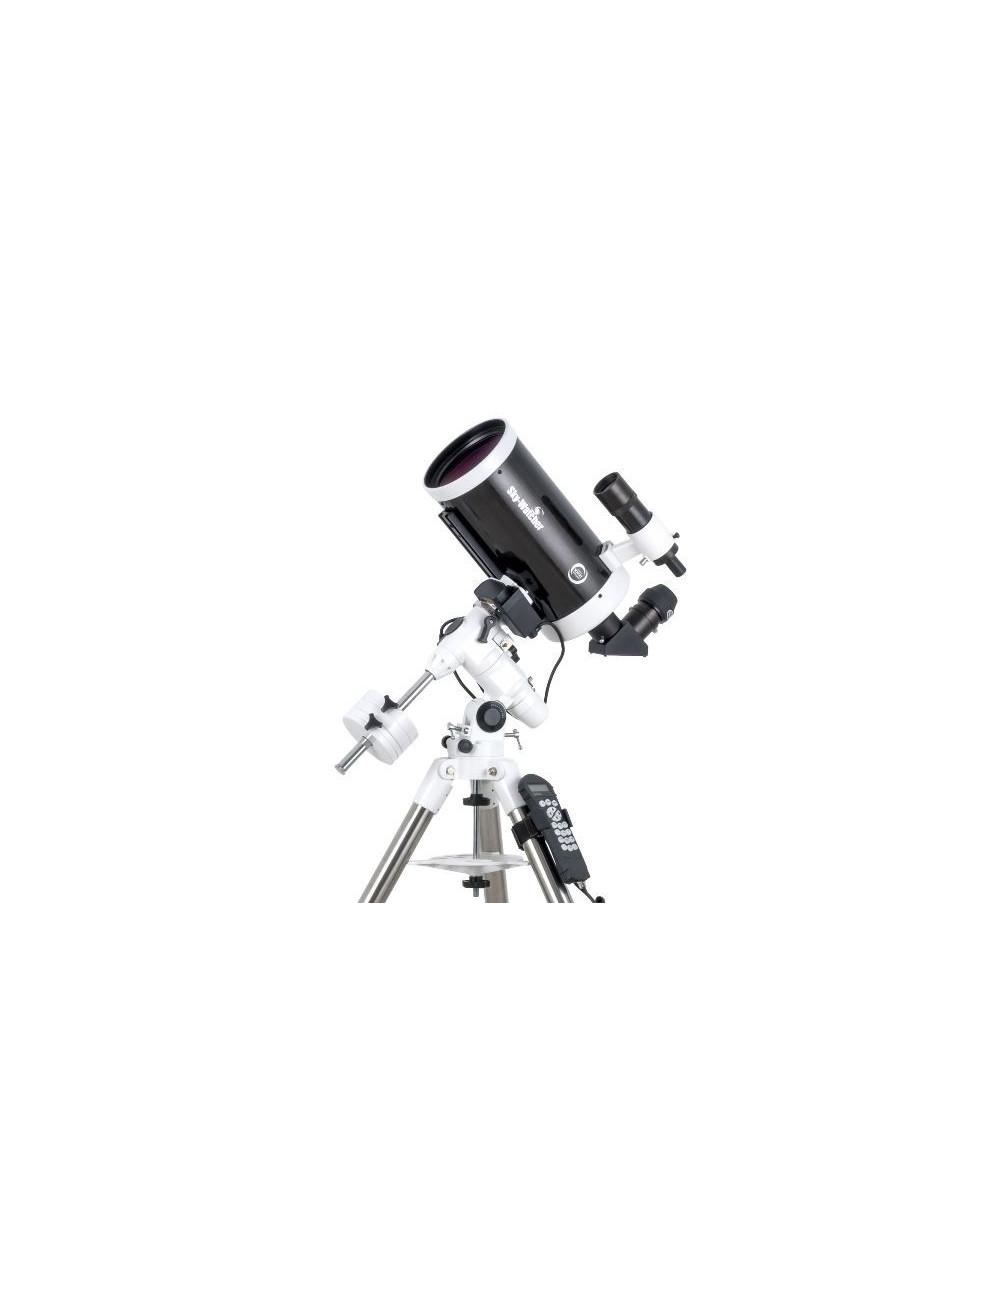 Télescope Sky-Watcher Mak150 Black Diamond sur NEQ3-2 Pro Go-To